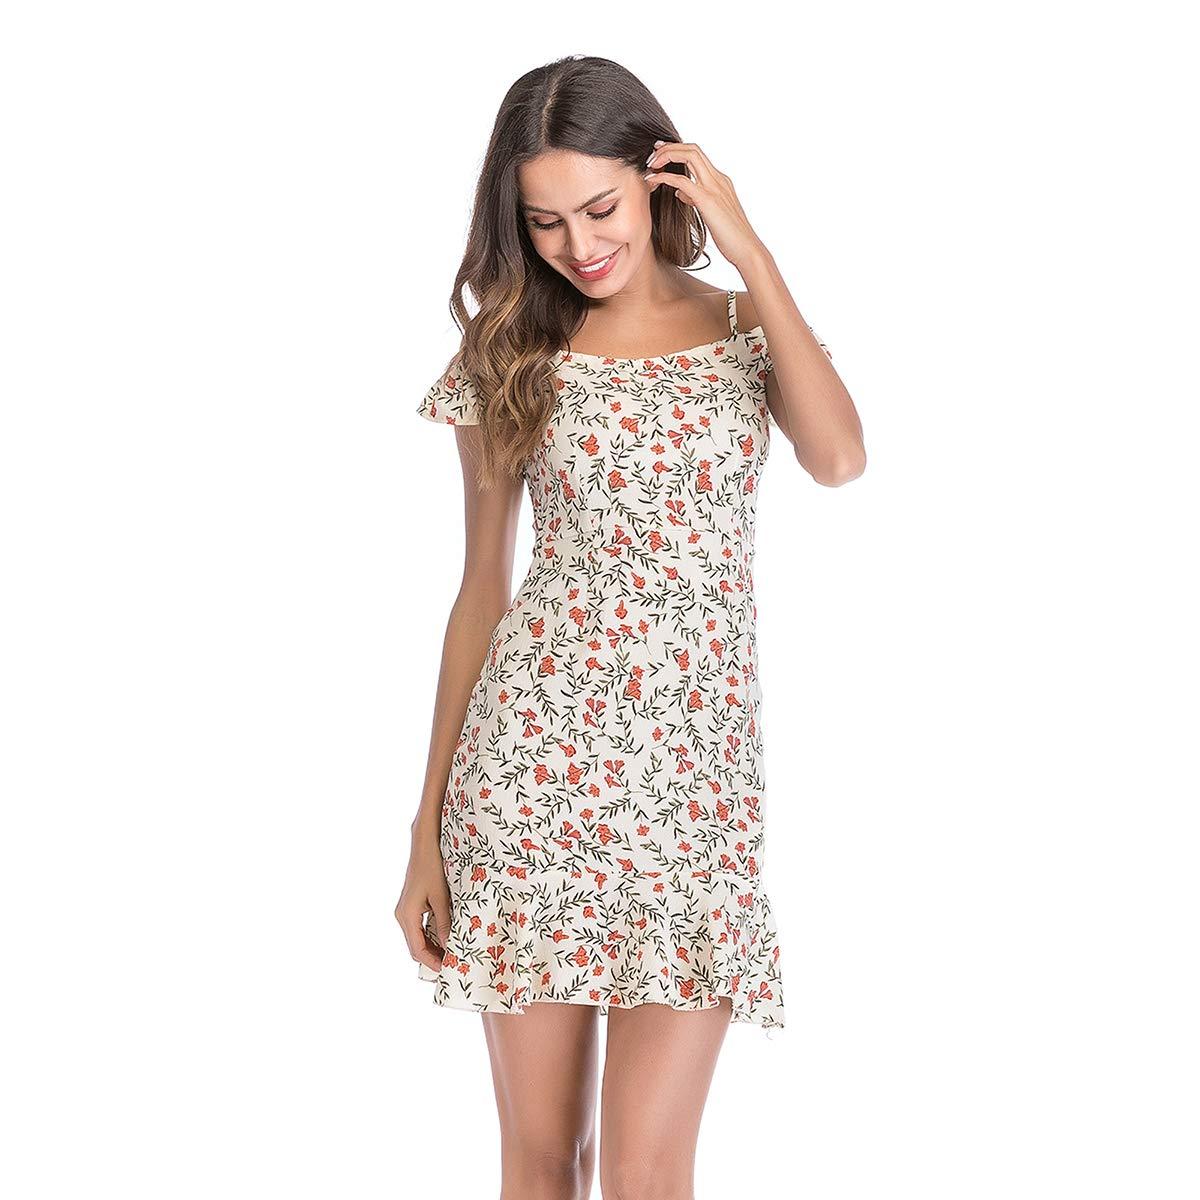 916eb3c97494c4 Woman s Off Shoulder Chiffon Ruffled Hem Floral Mini Beach Sexy Wrap Dress  at Amazon Women s Clothing store